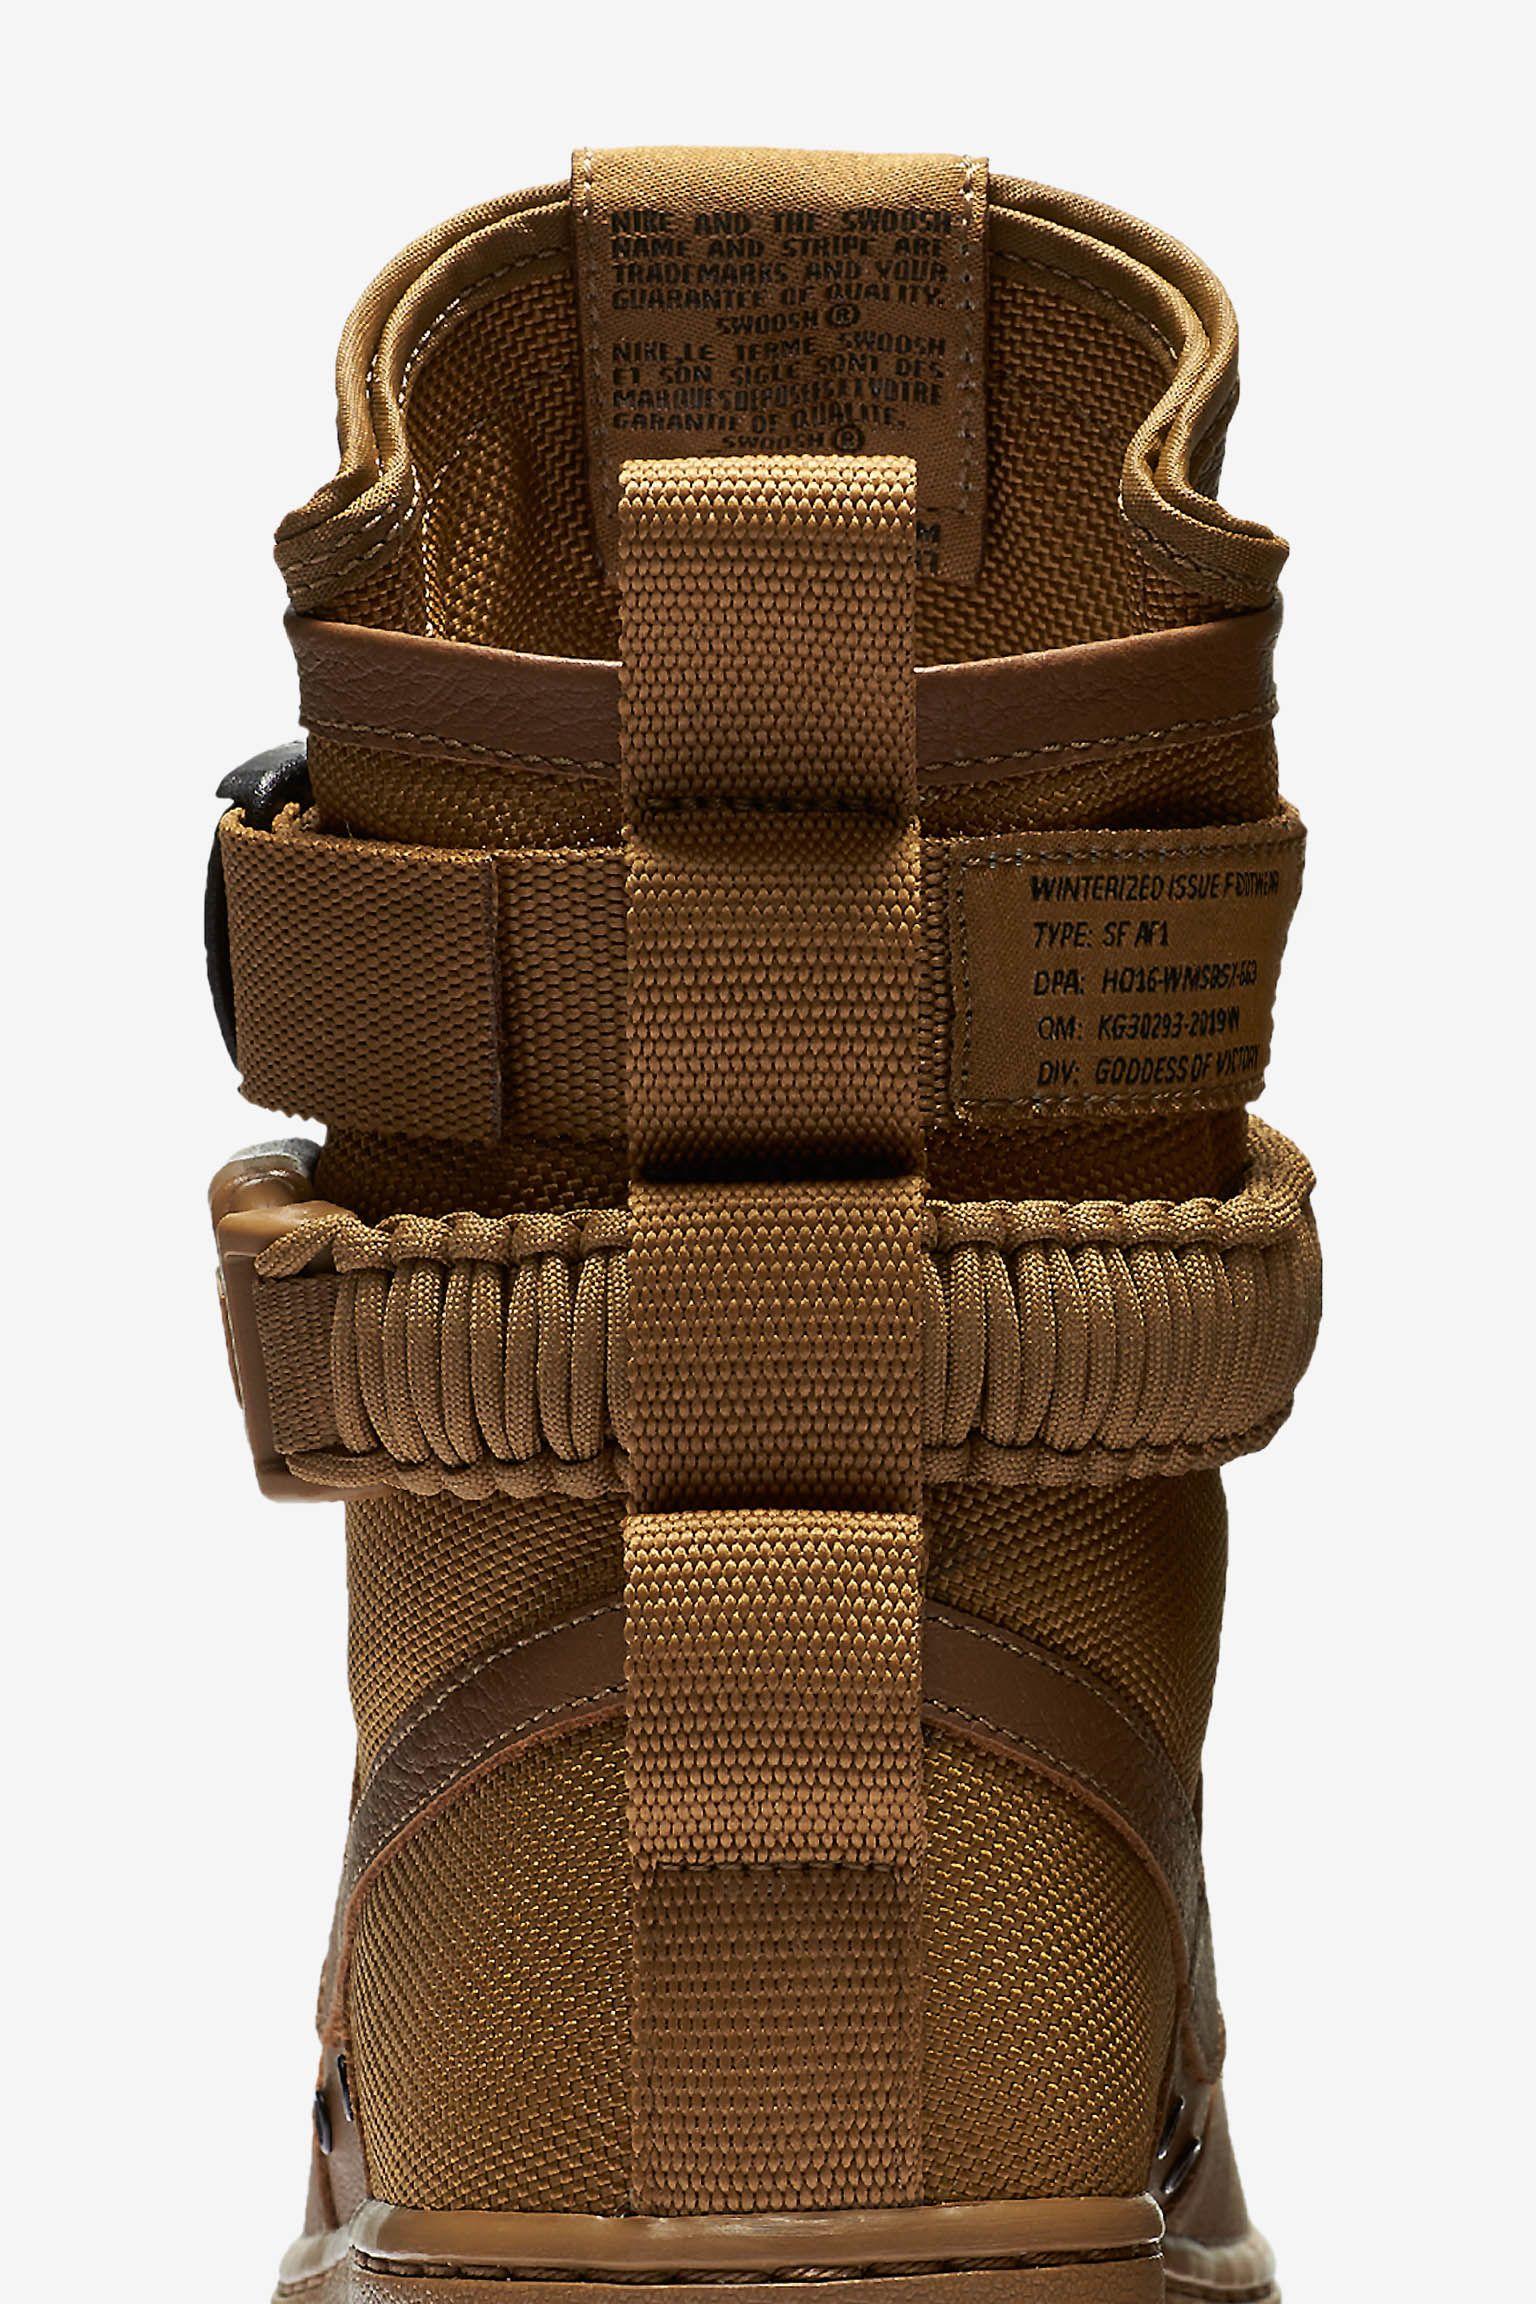 Nike Special Field Air Force 1 « Golden Beige » pour Femme. Date de sortie